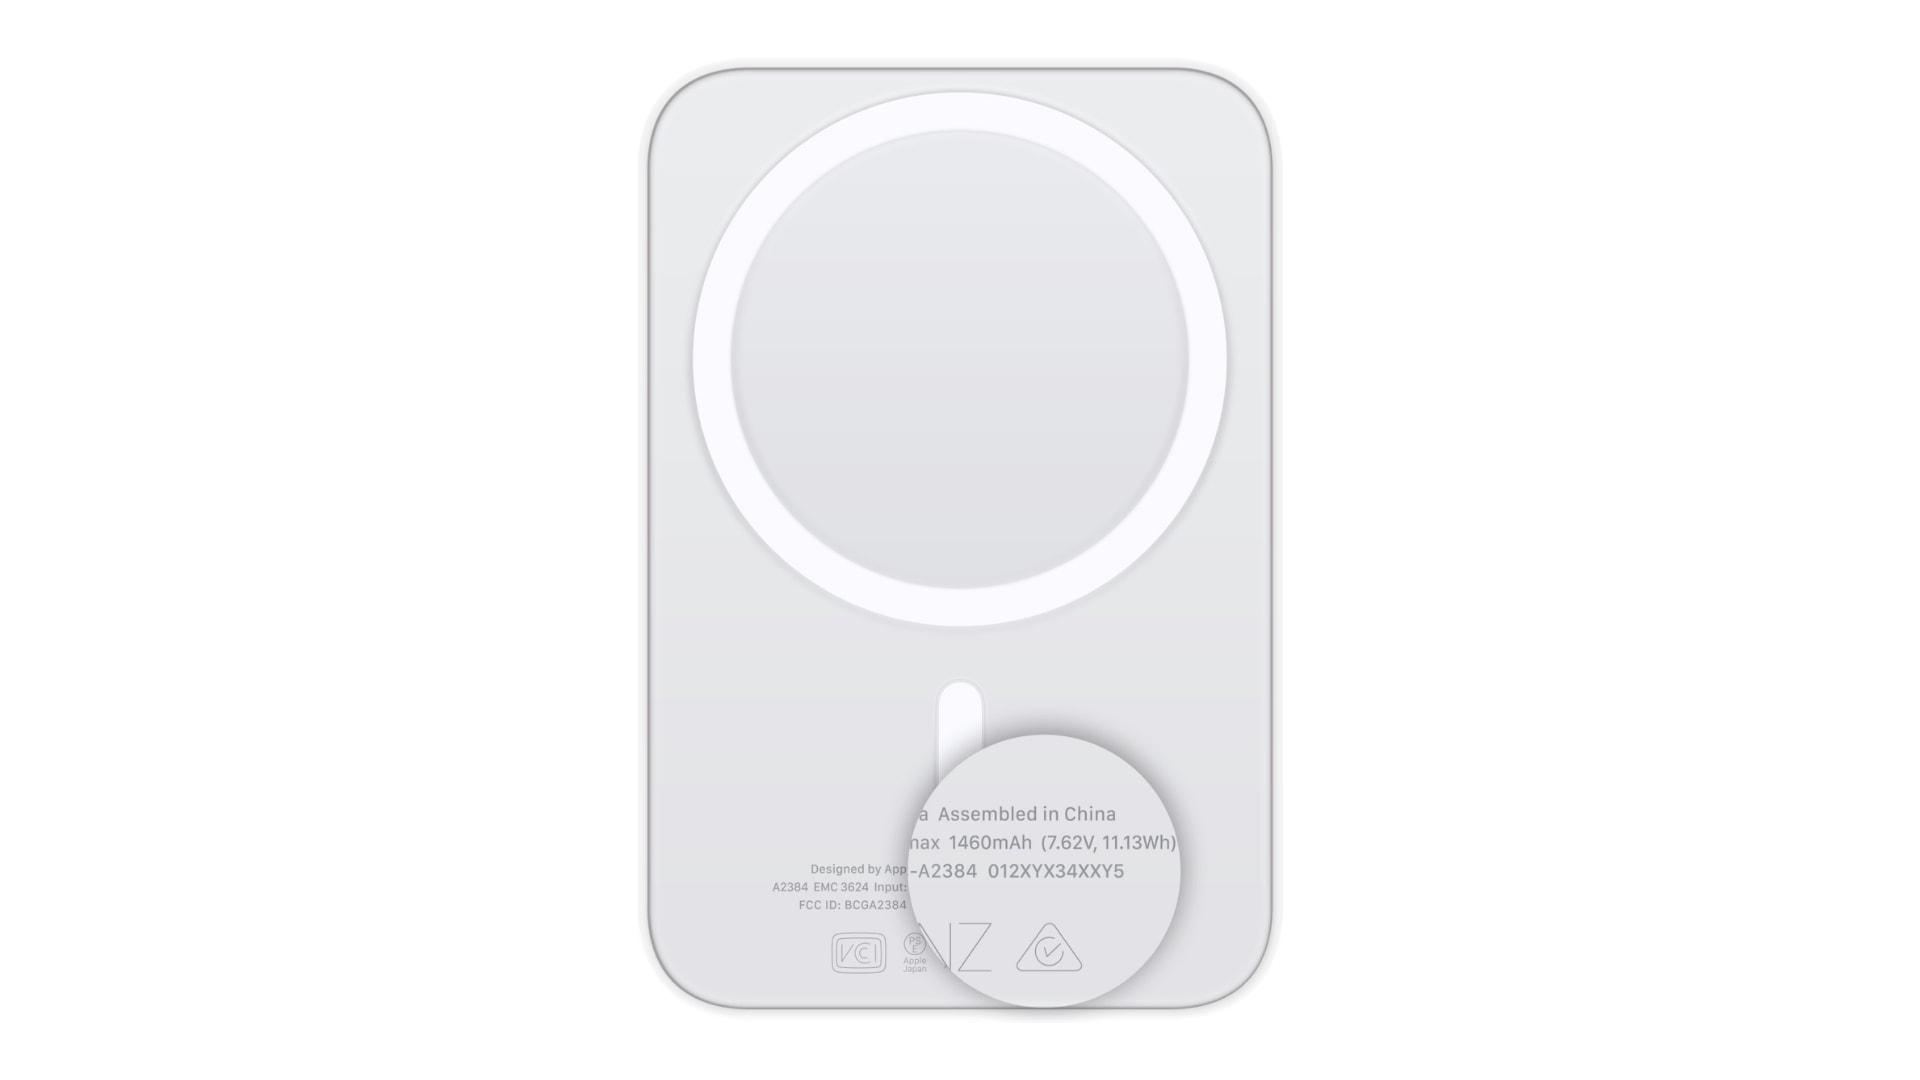 Find MagSafe Battery Pack serial number